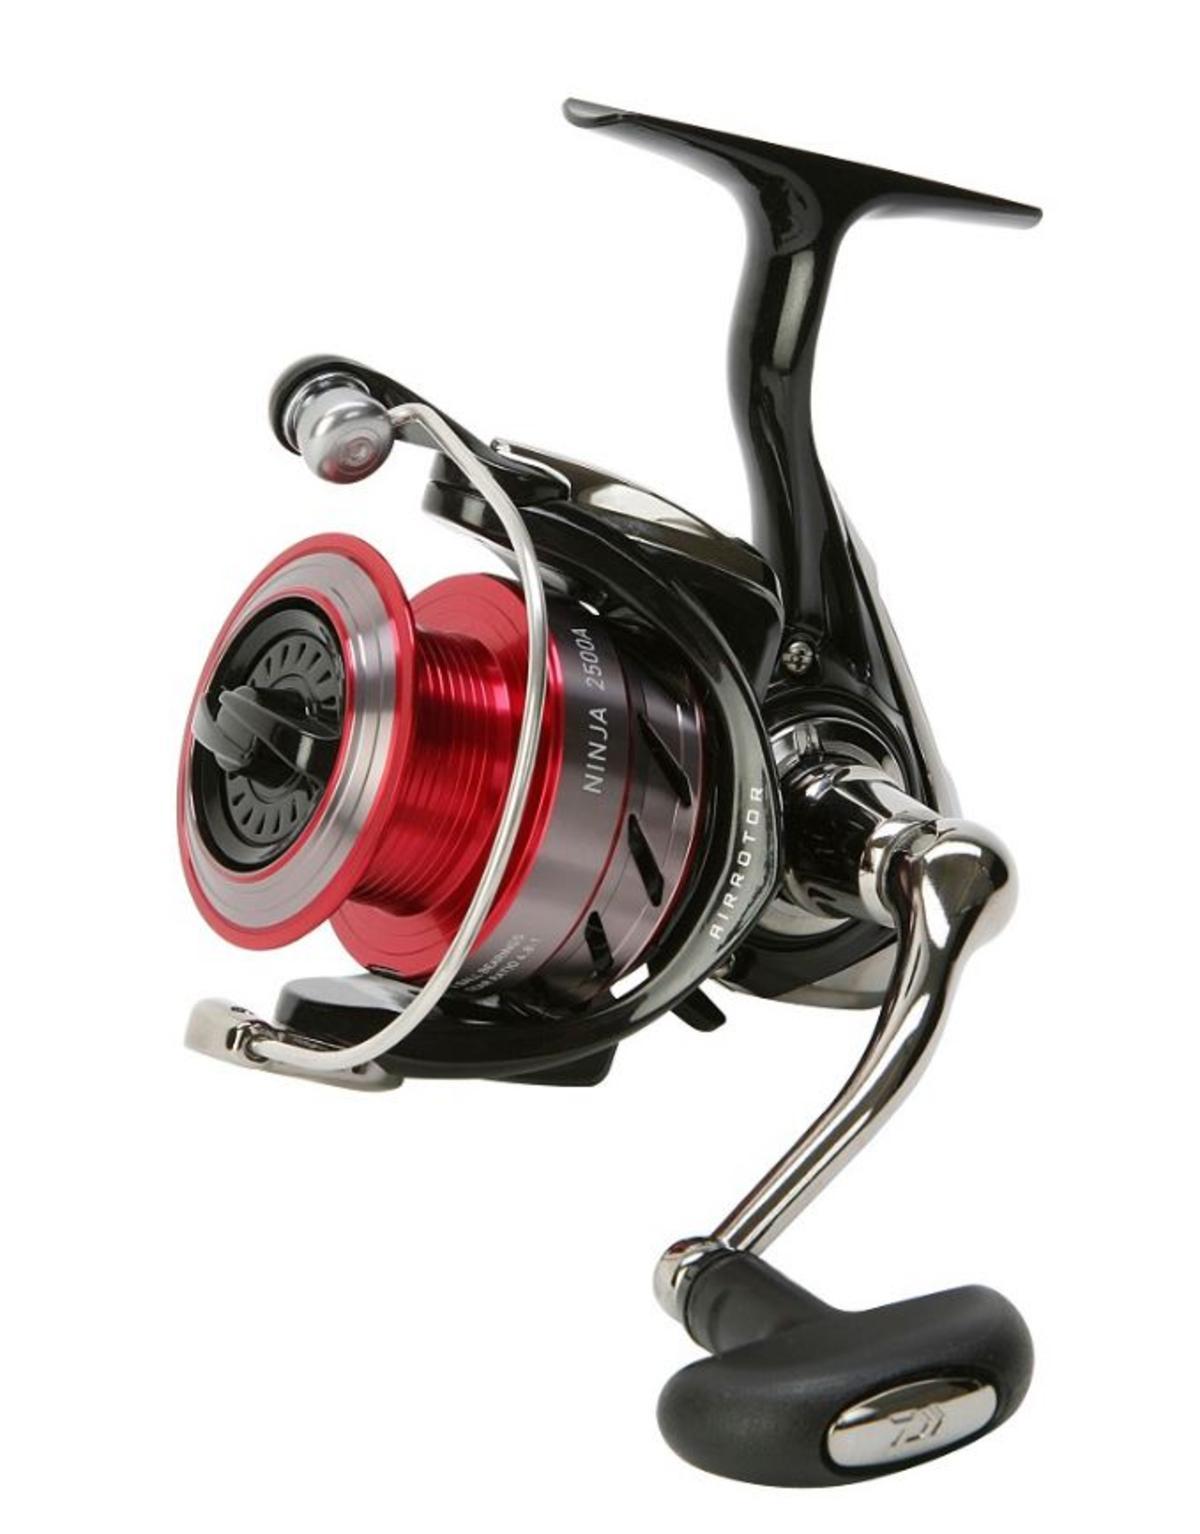 Ex Display Daiwa Ninja match 2508A Spinning Fishing Reel